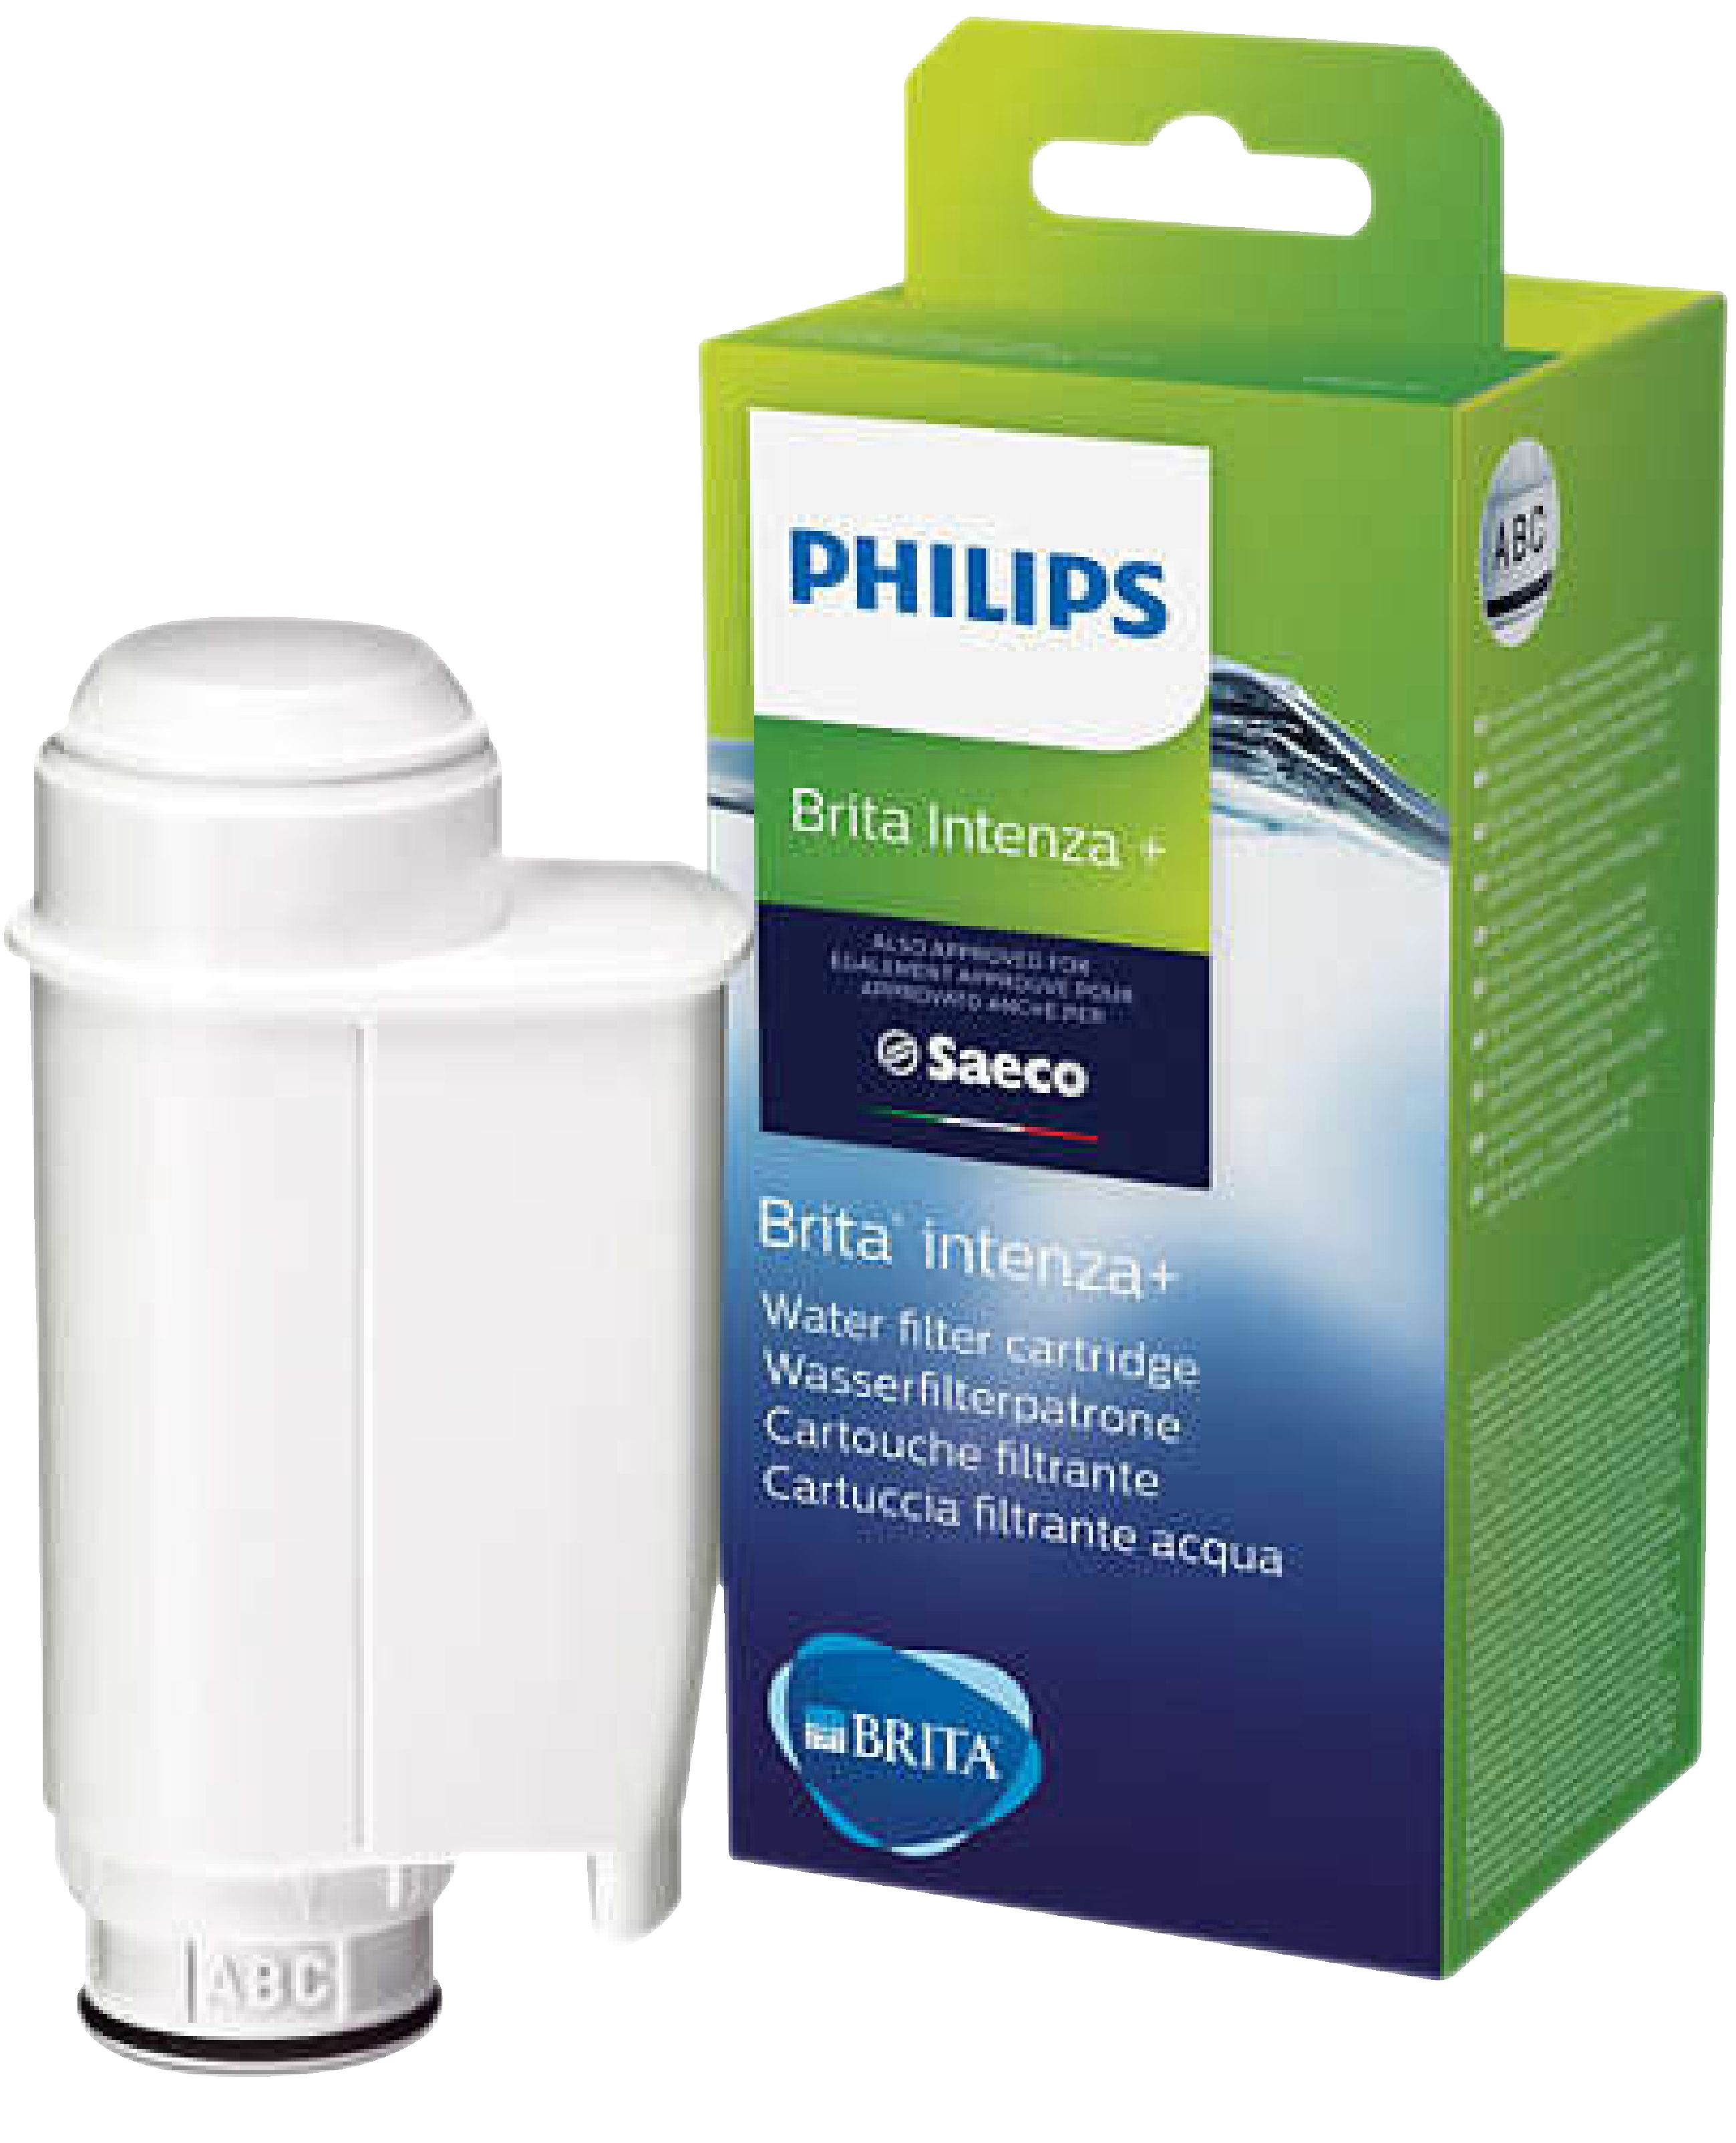 Vodní filtr Philips pro Saeco Espresso CA6702/10